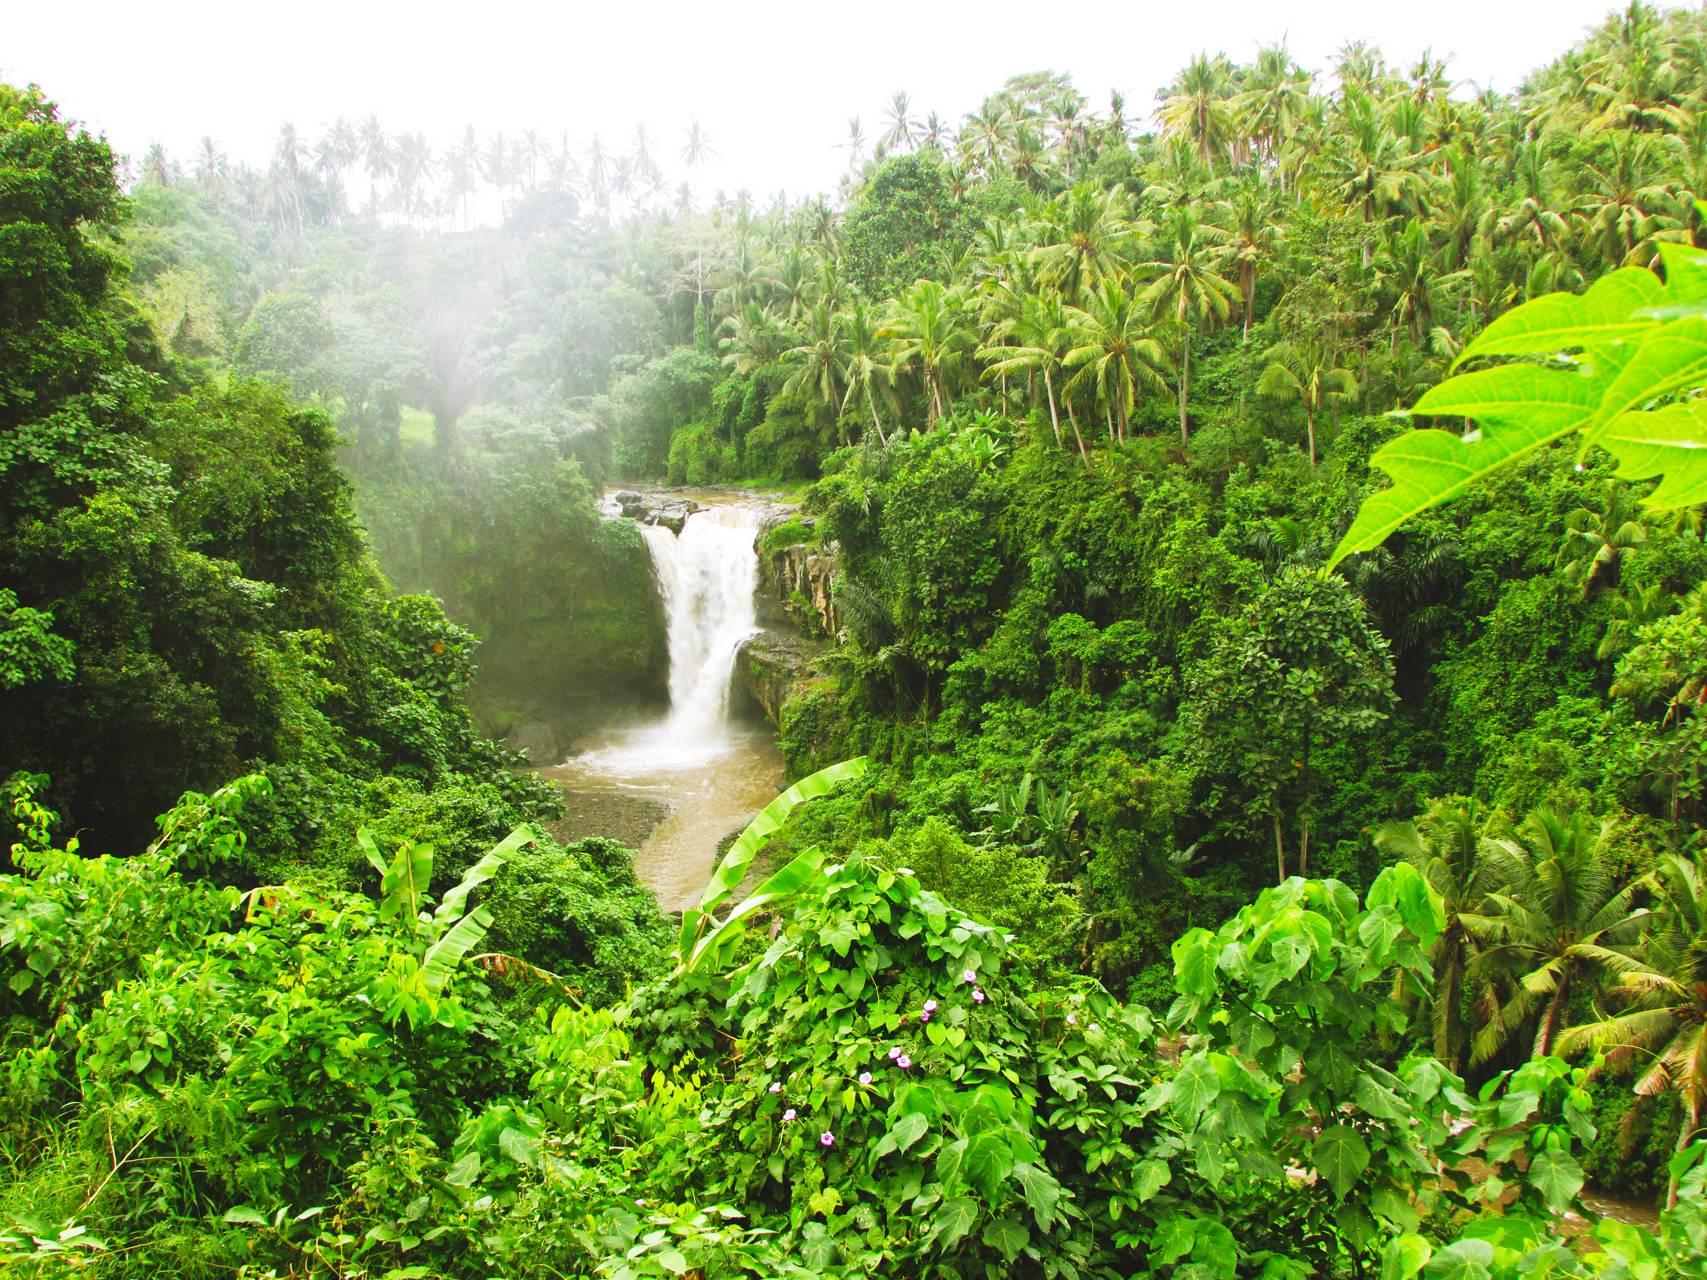 The Falls of Bali